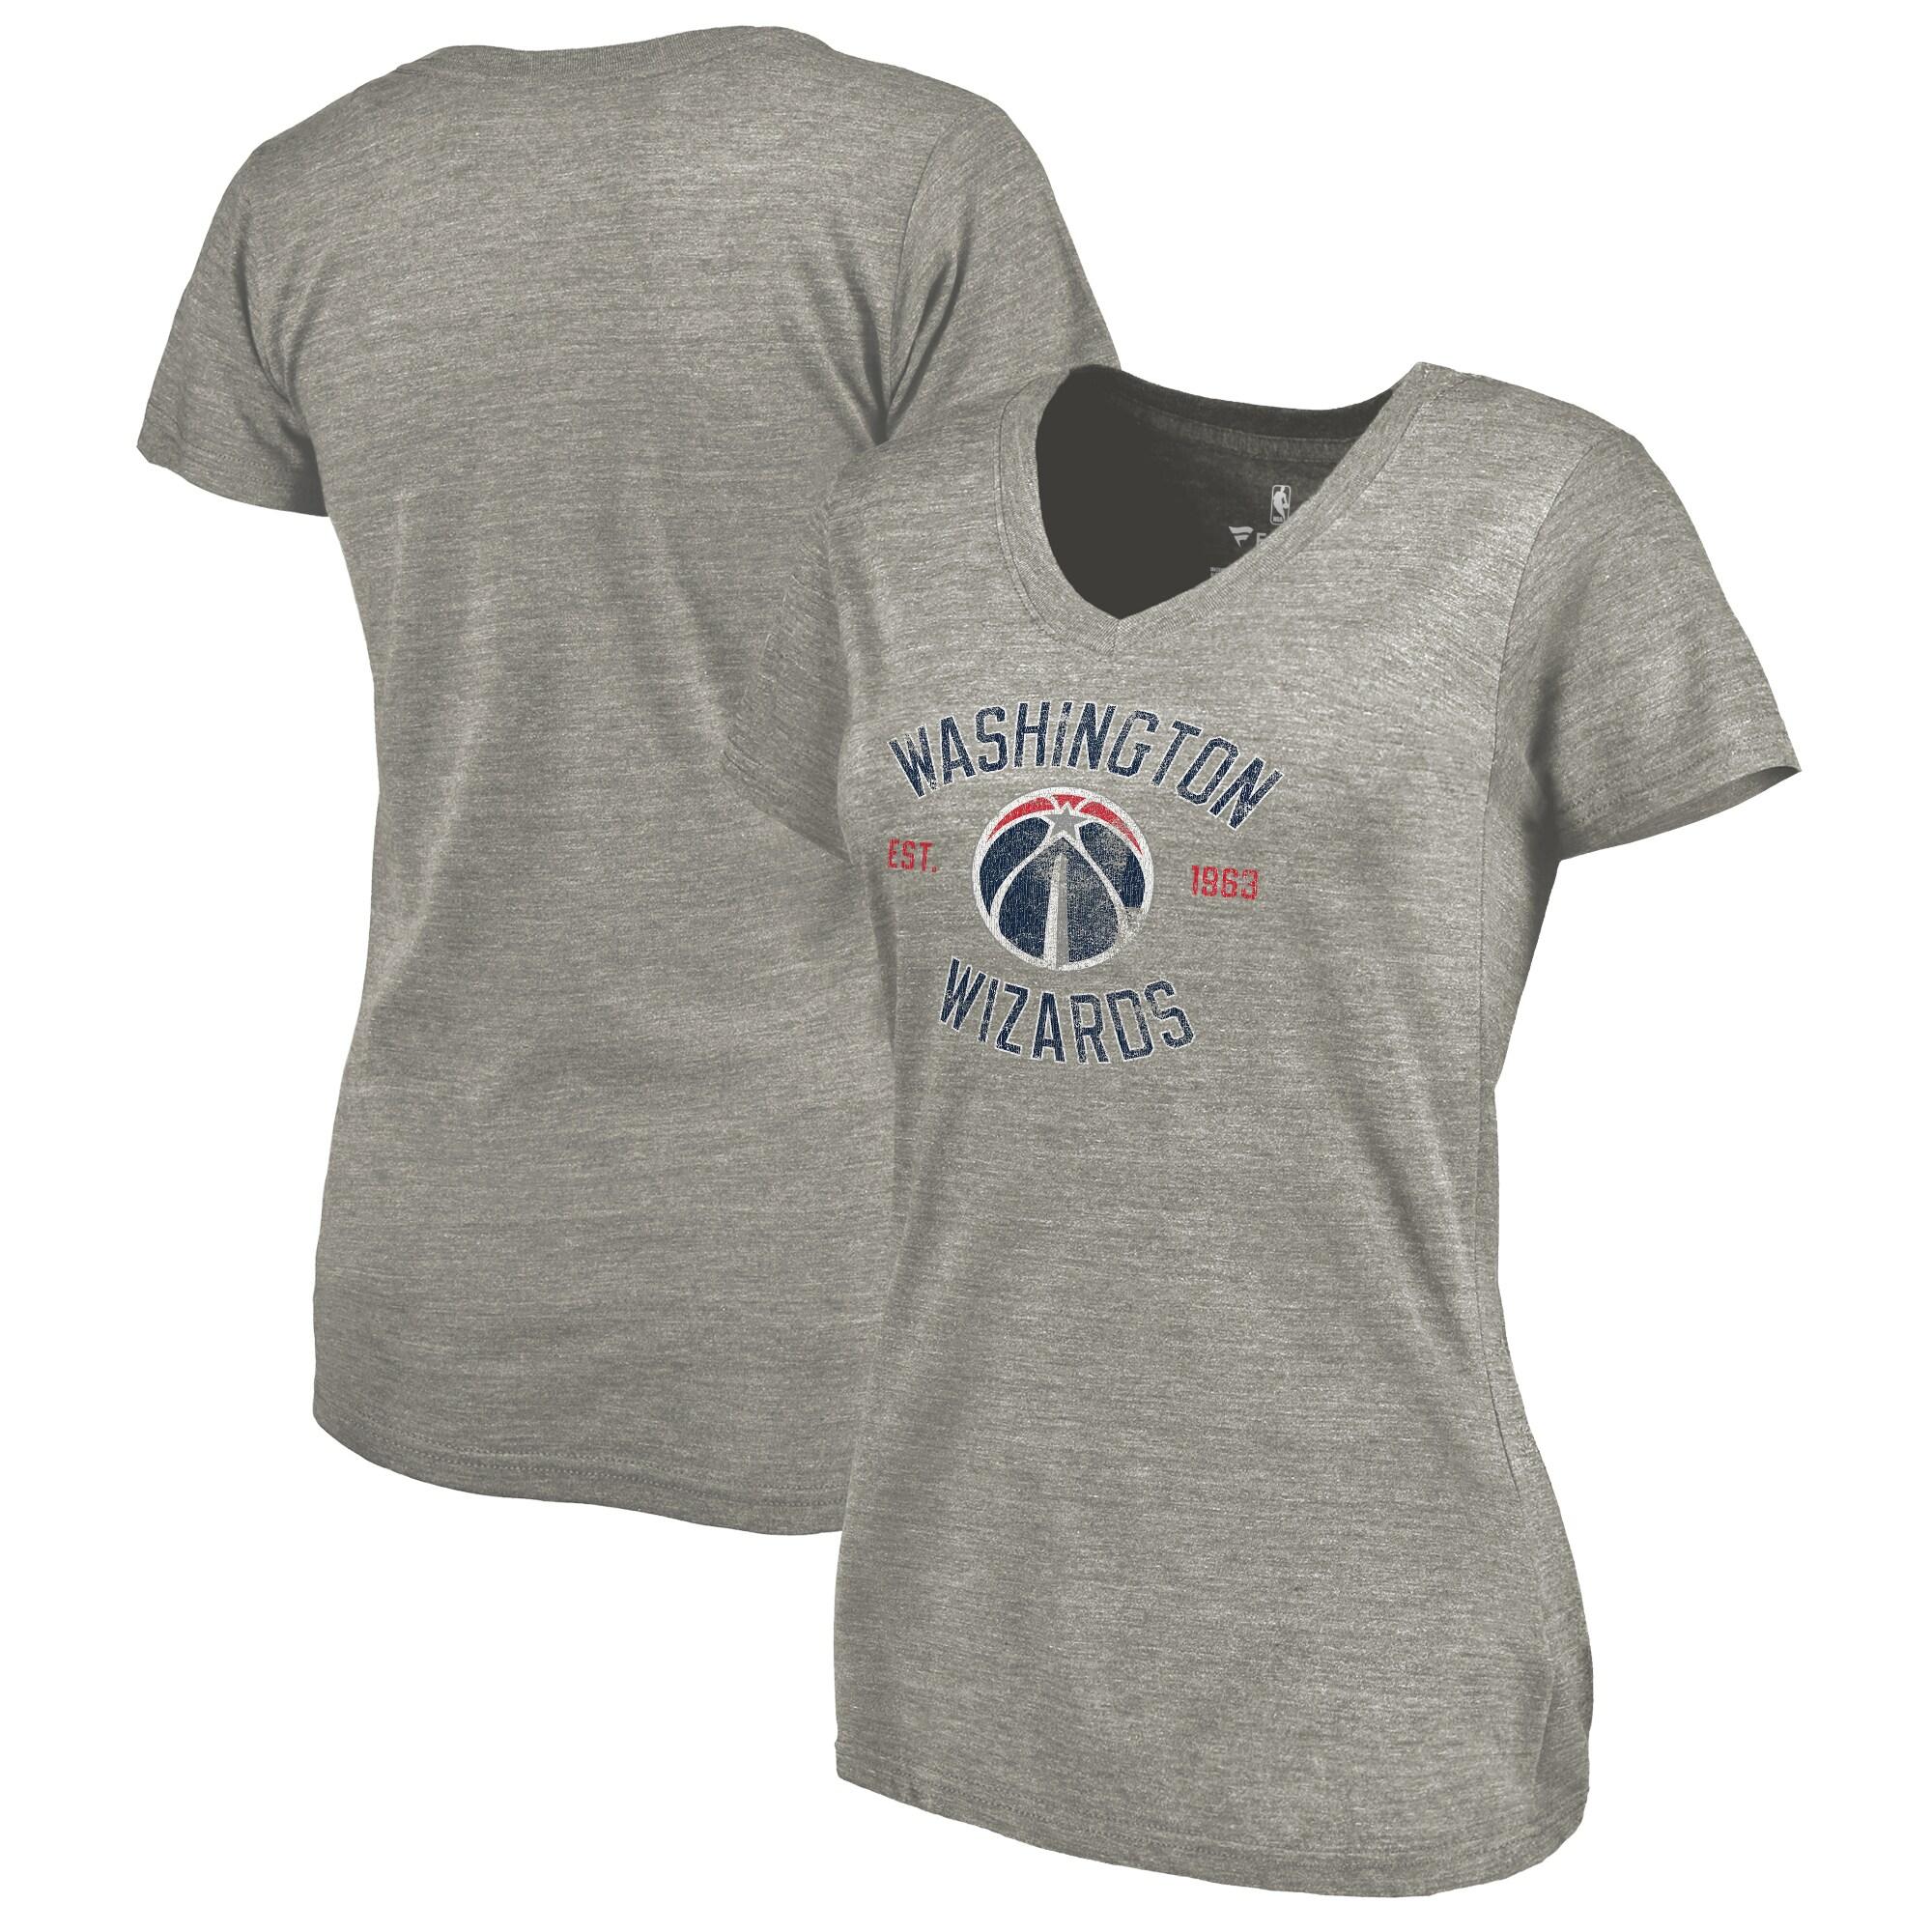 Washington Wizards Fanatics Branded Women's Heritage Tri-Blend V-Neck T-Shirt - Heathered Gray